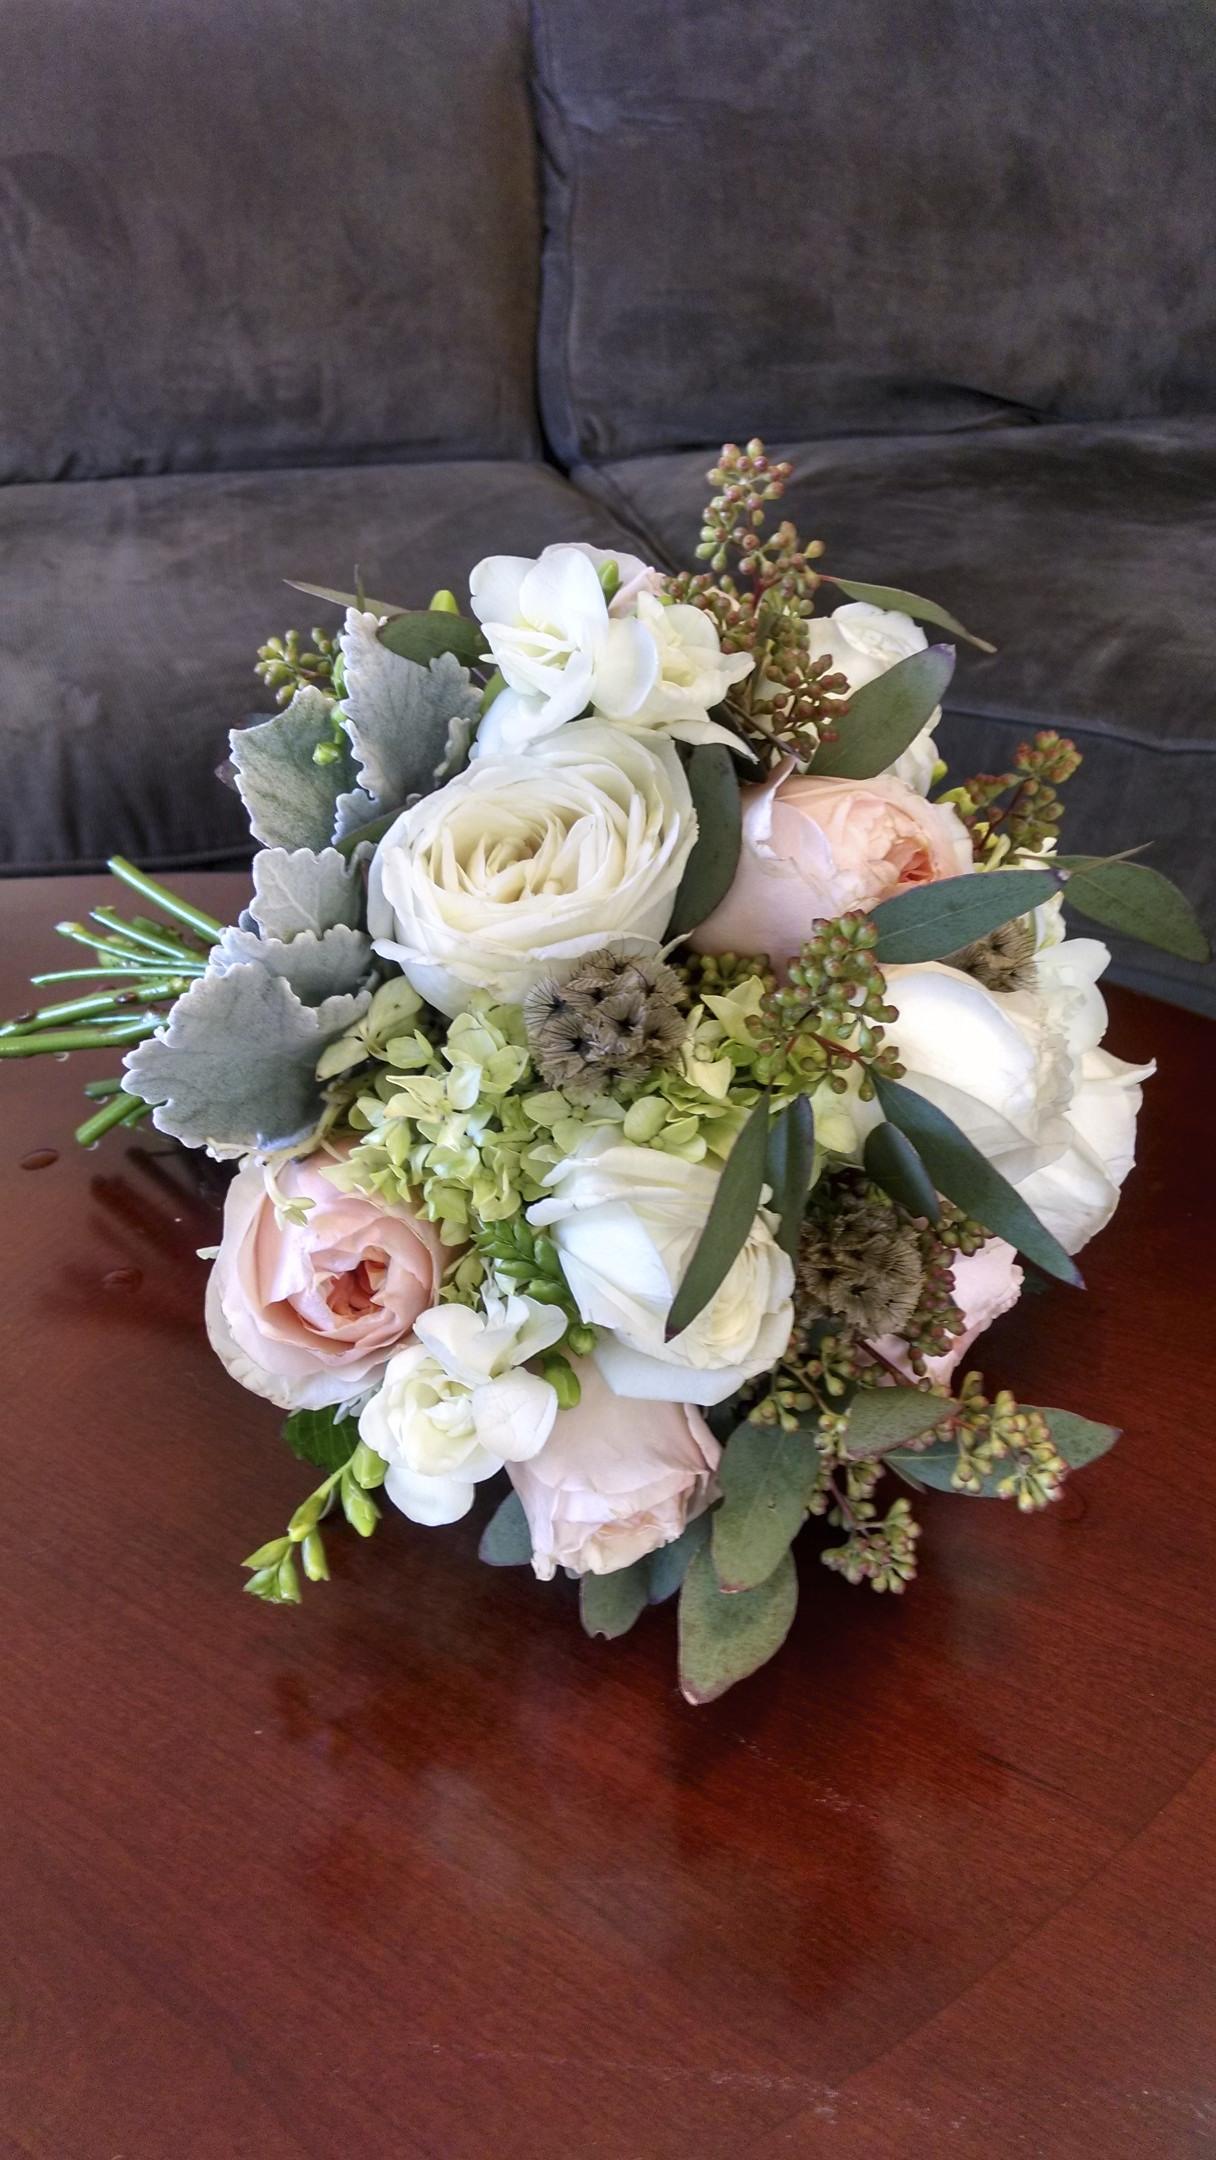 Garden Roses, Freesia, seeded Eucalyptus, Dusty Miller, Scabiosa seedpods.